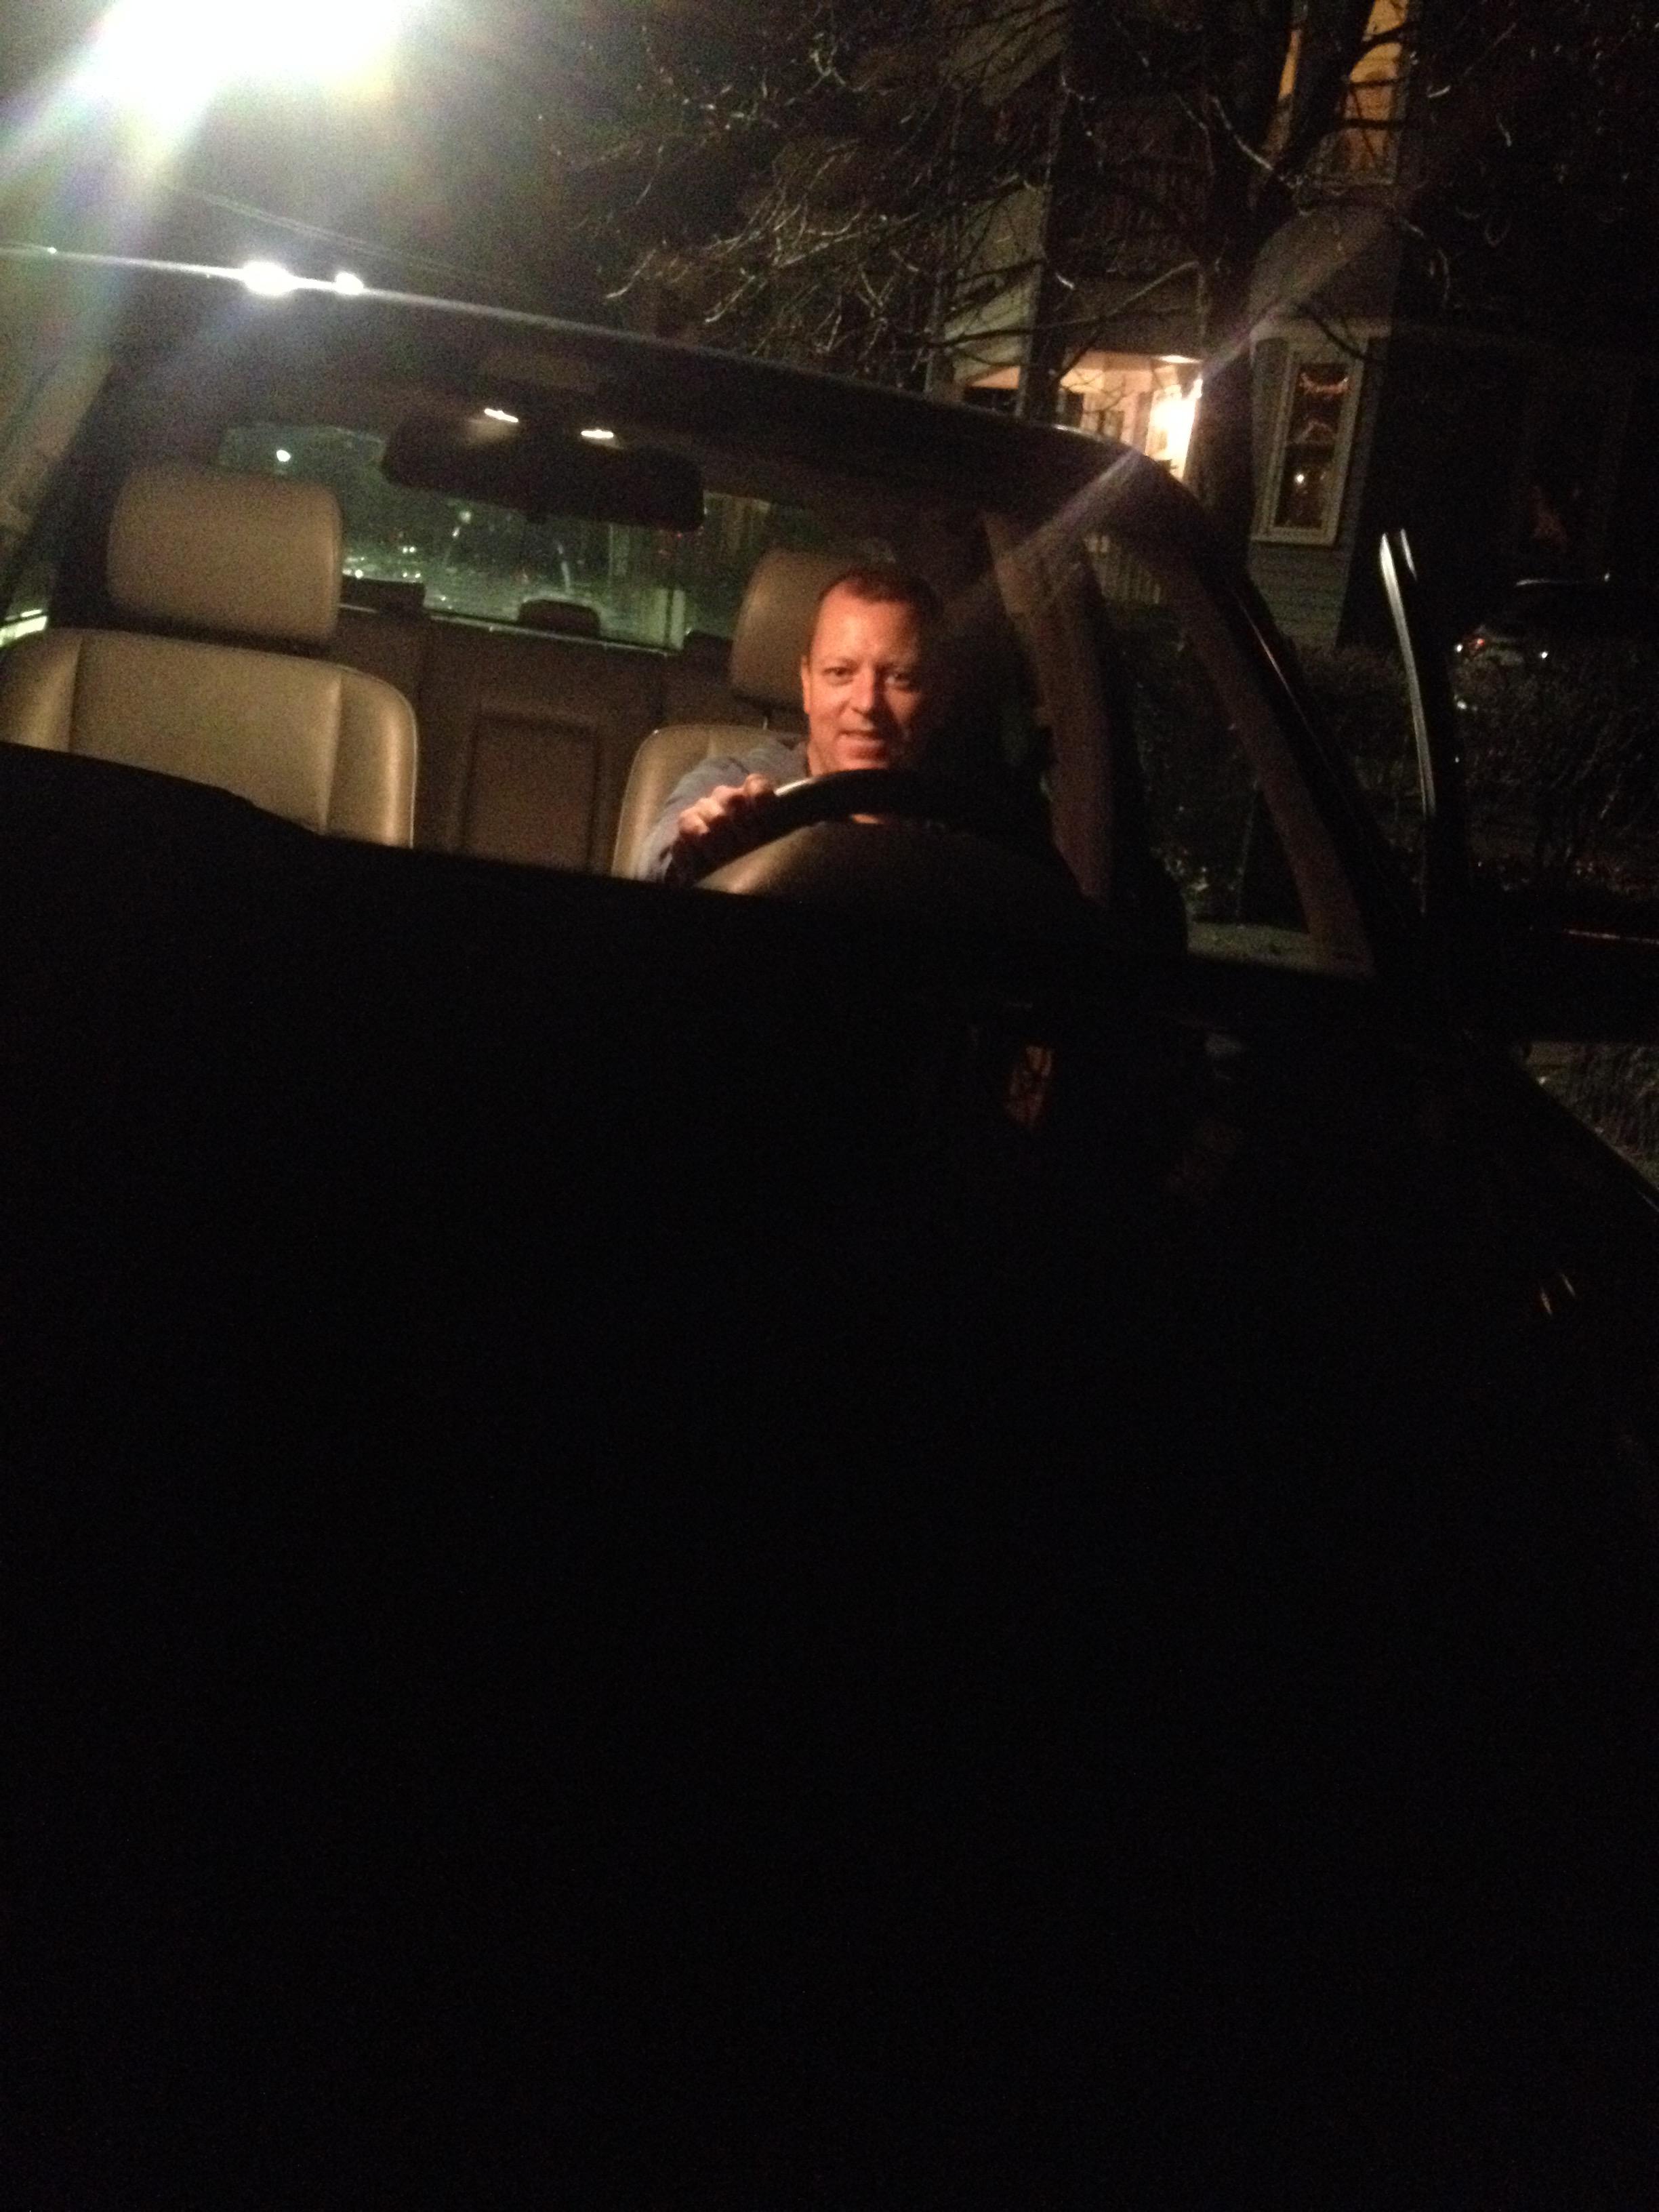 mike driving 2.jpg